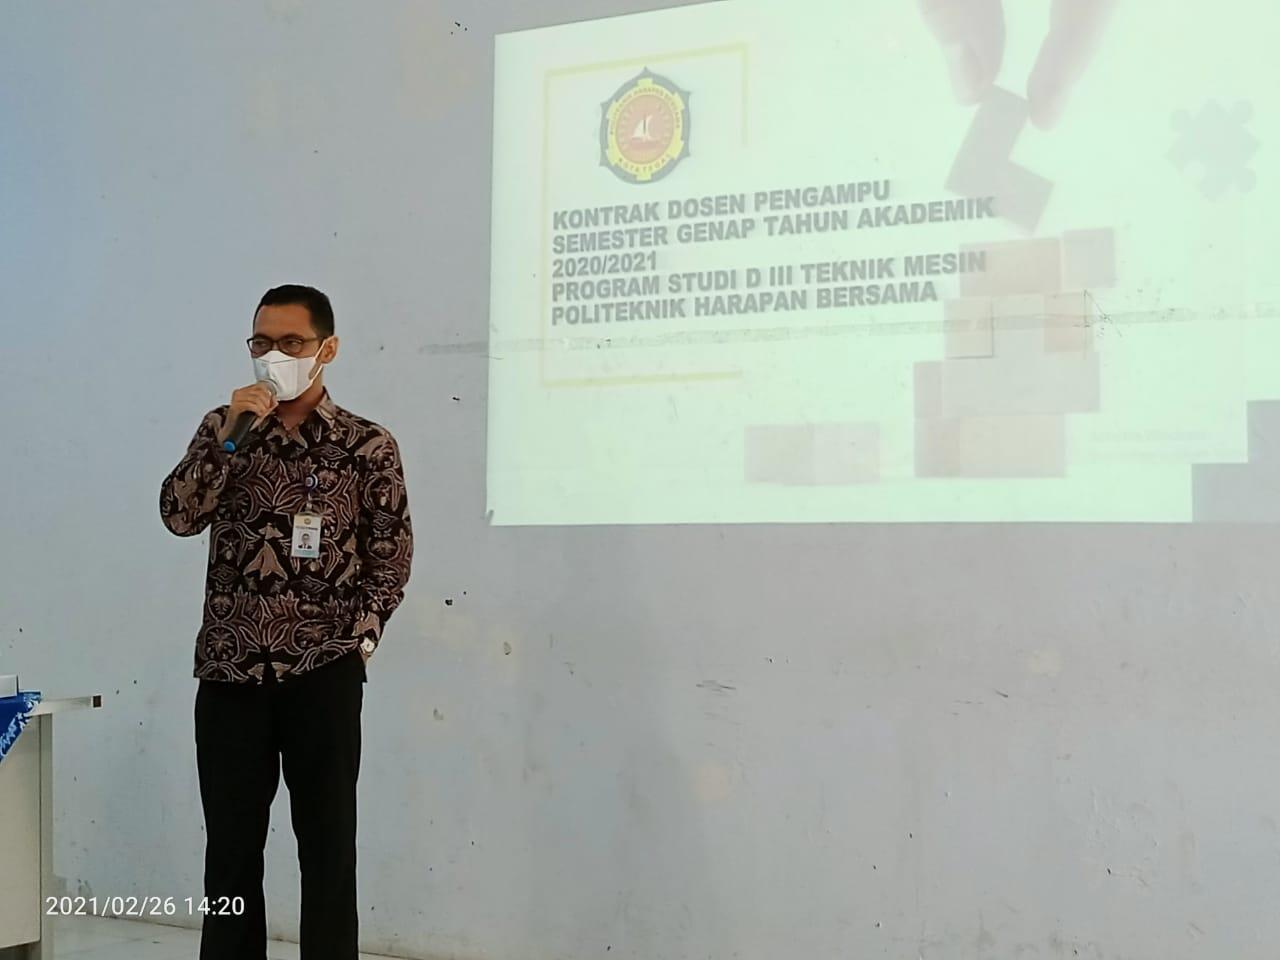 Kontrak Program Dosen Pengampu Prodi DIII Teknik Mesin Semester Genap TA 2020/2021.